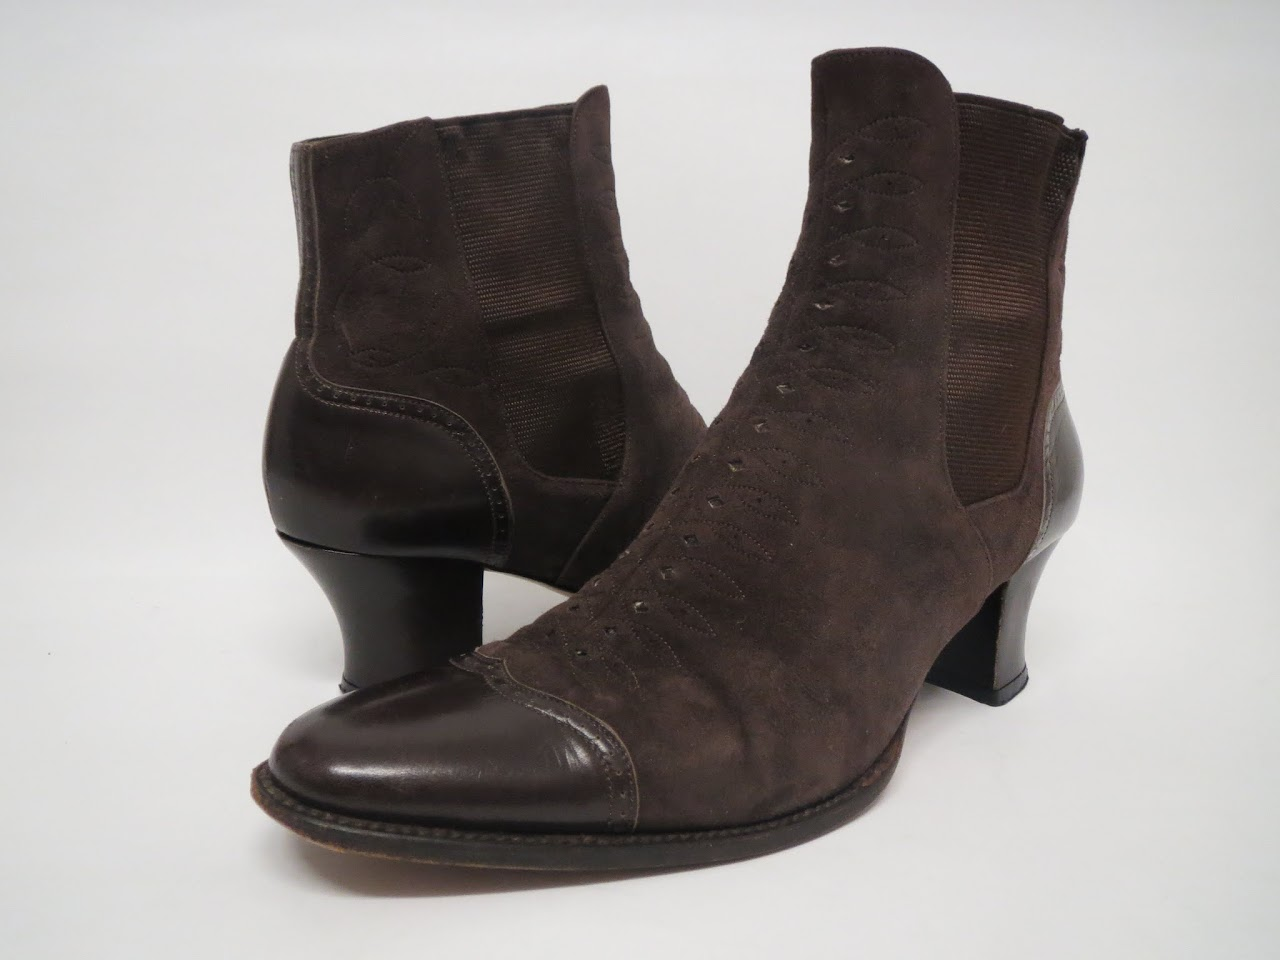 Stephane Kilian Brown Suede Boots